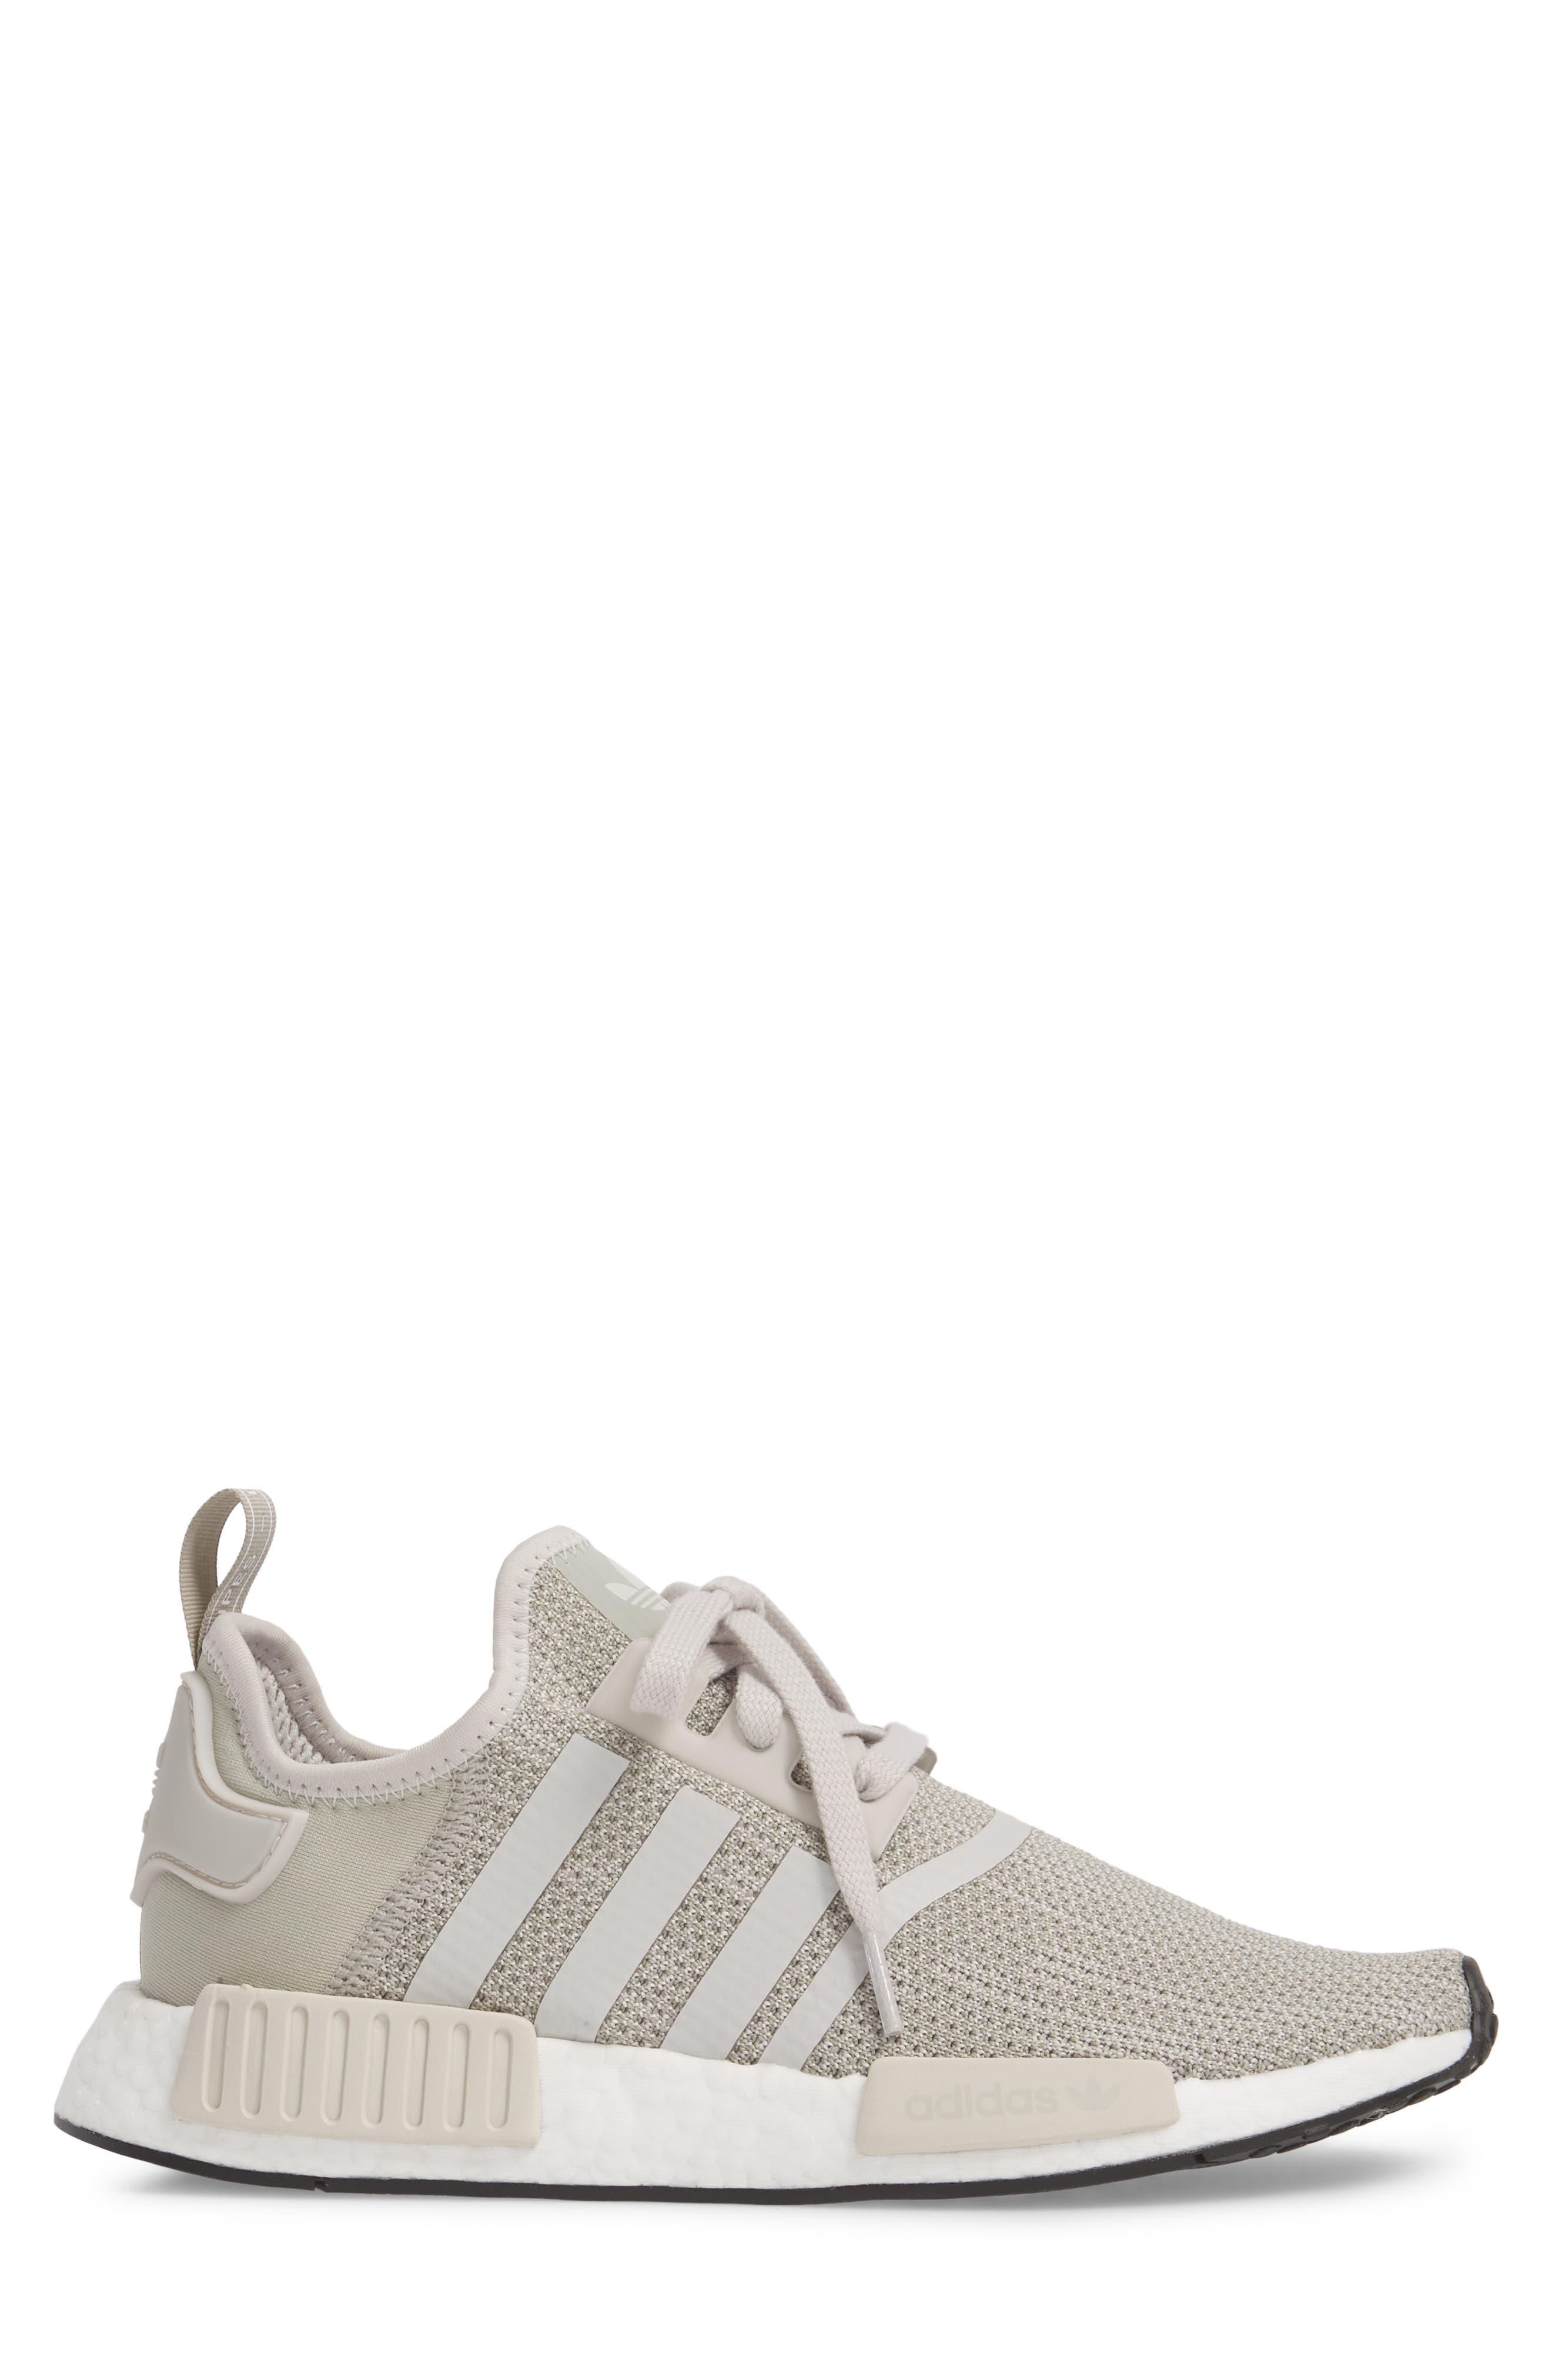 NMD_R1 Sneaker,                             Alternate thumbnail 3, color,                             Raw Gold/ Tech Beige/ Black